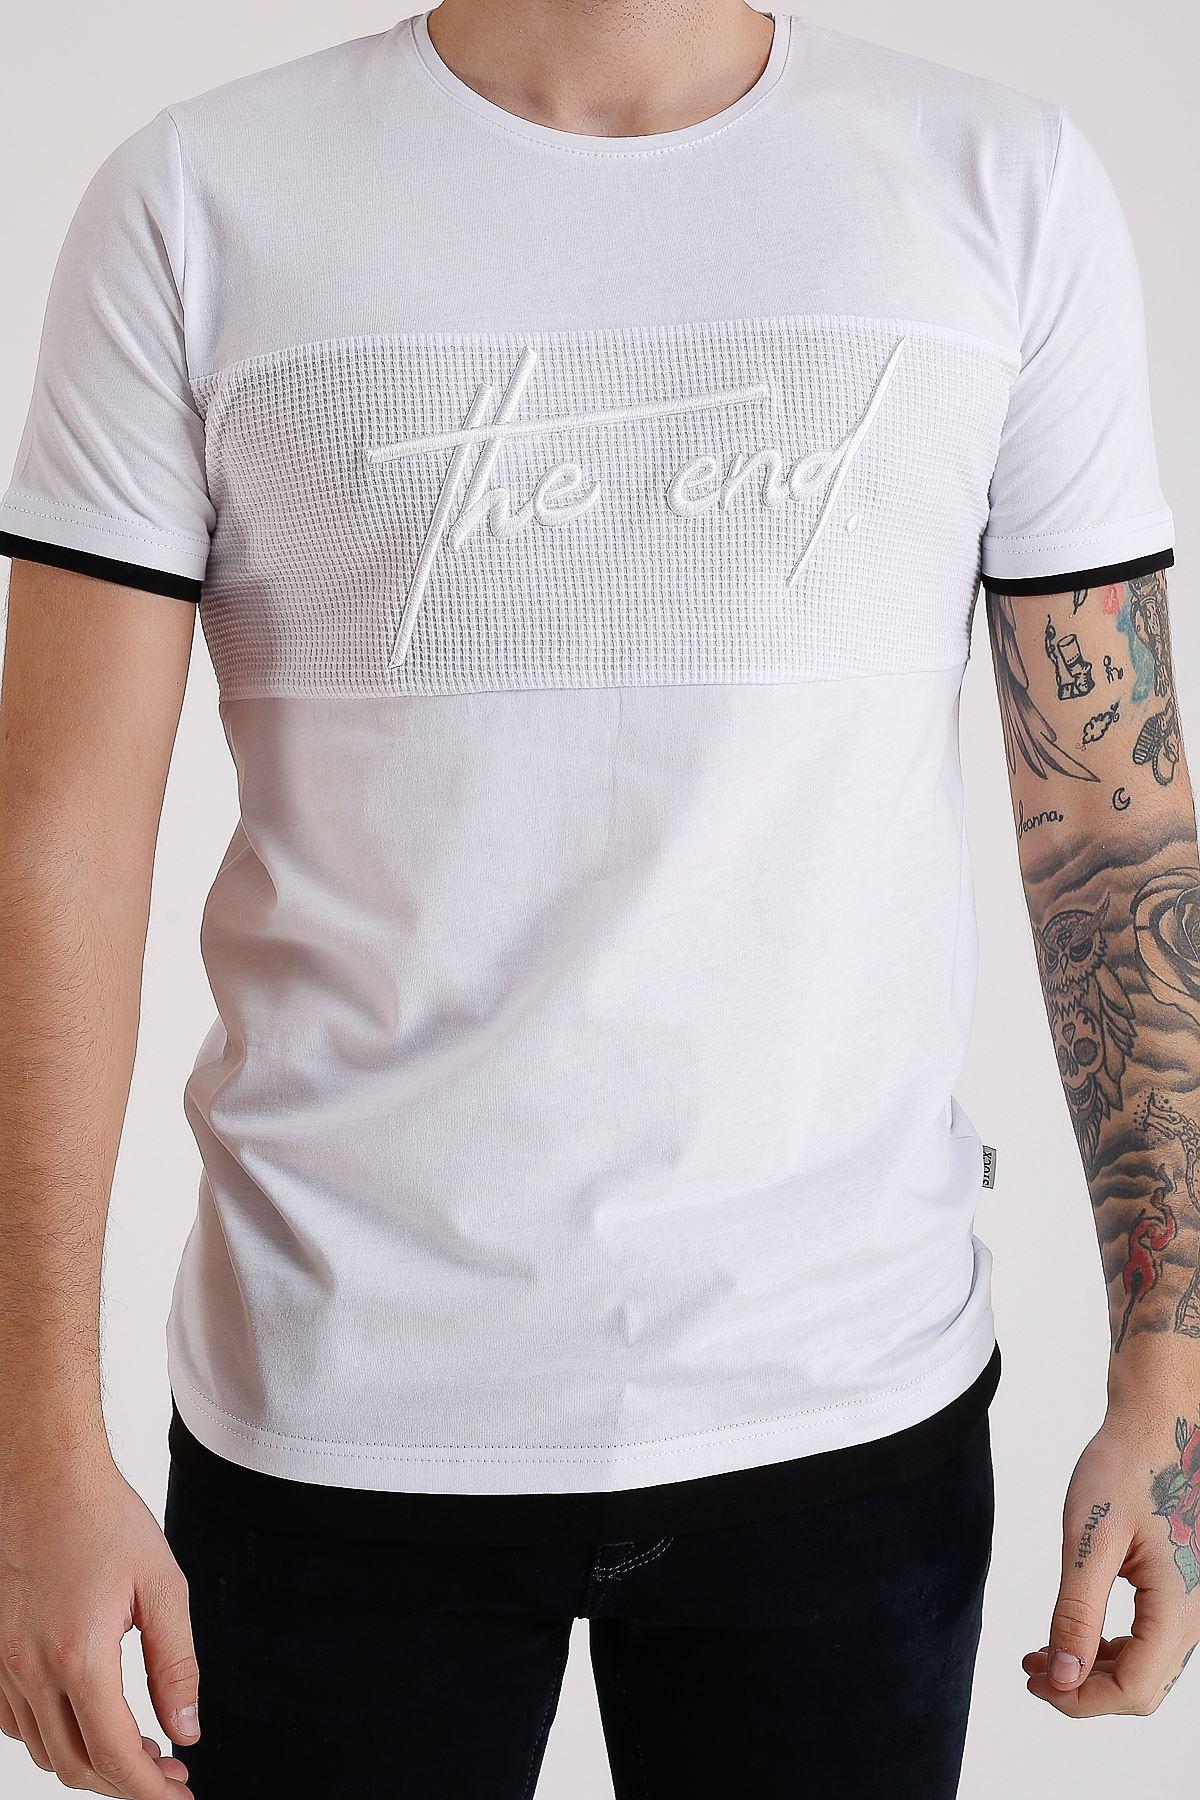 Bisiklet Yaka Nakışlı Beyaz Erkek Penye T-Shirt